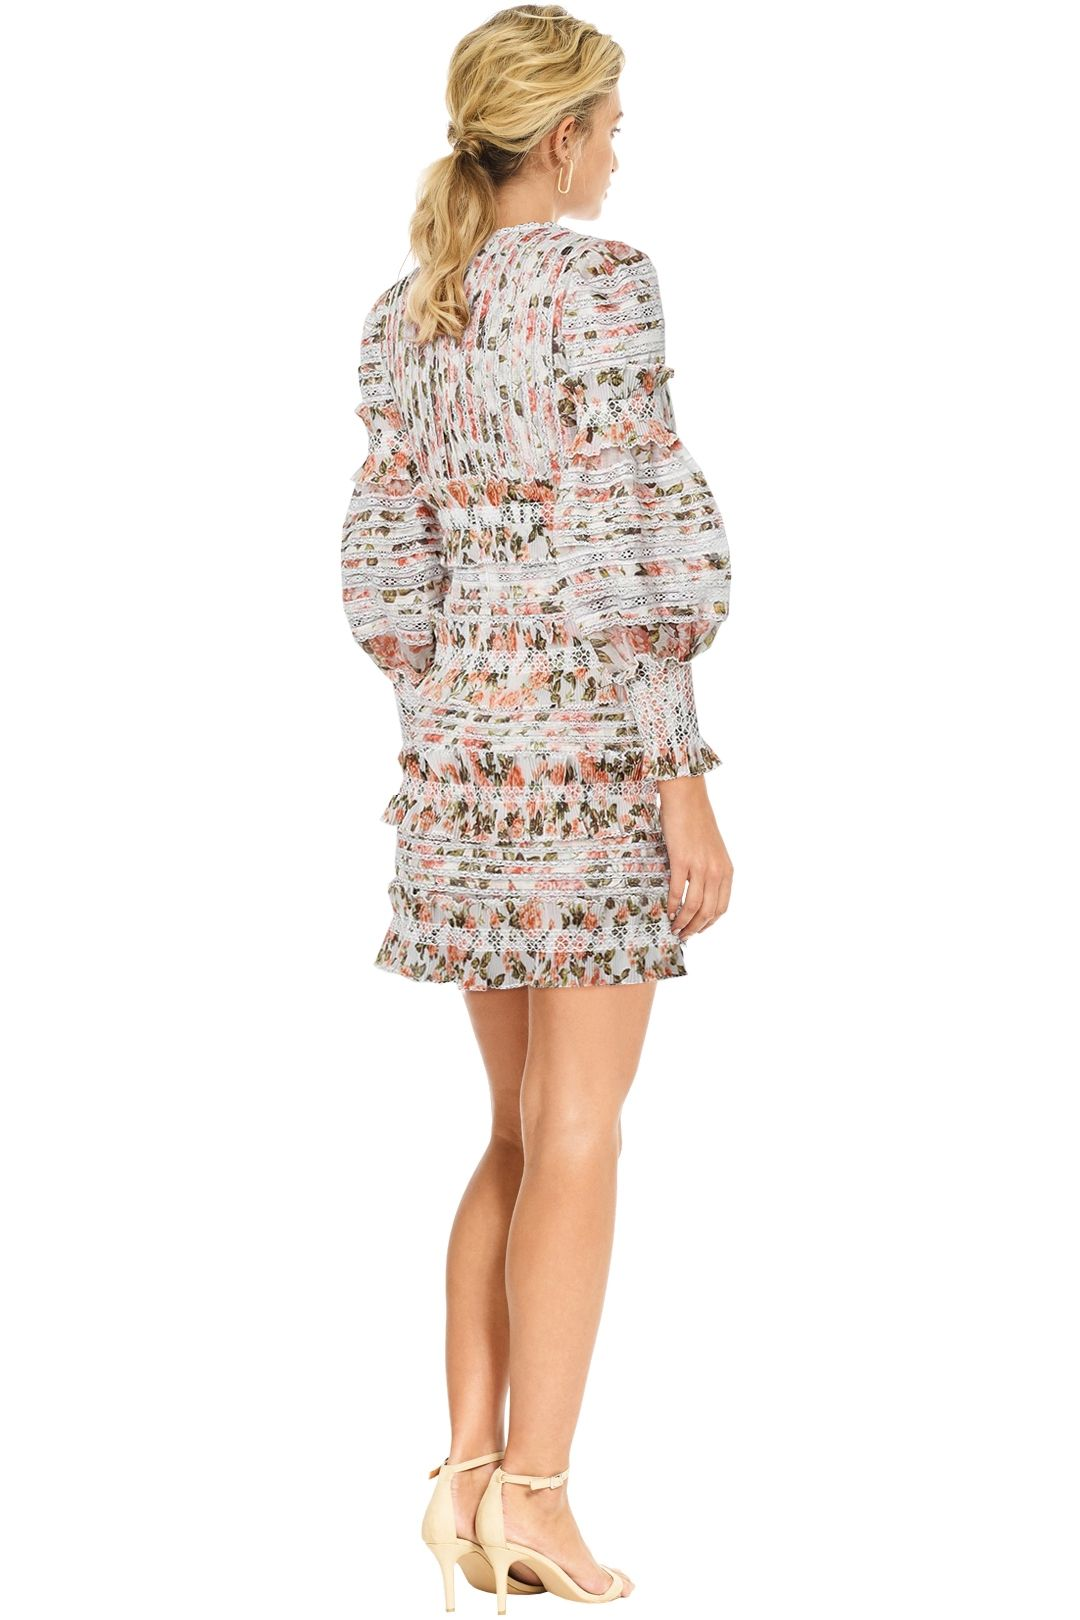 Zimmermann - Radiate Smocked Mini Dress - Peach Floral - Back